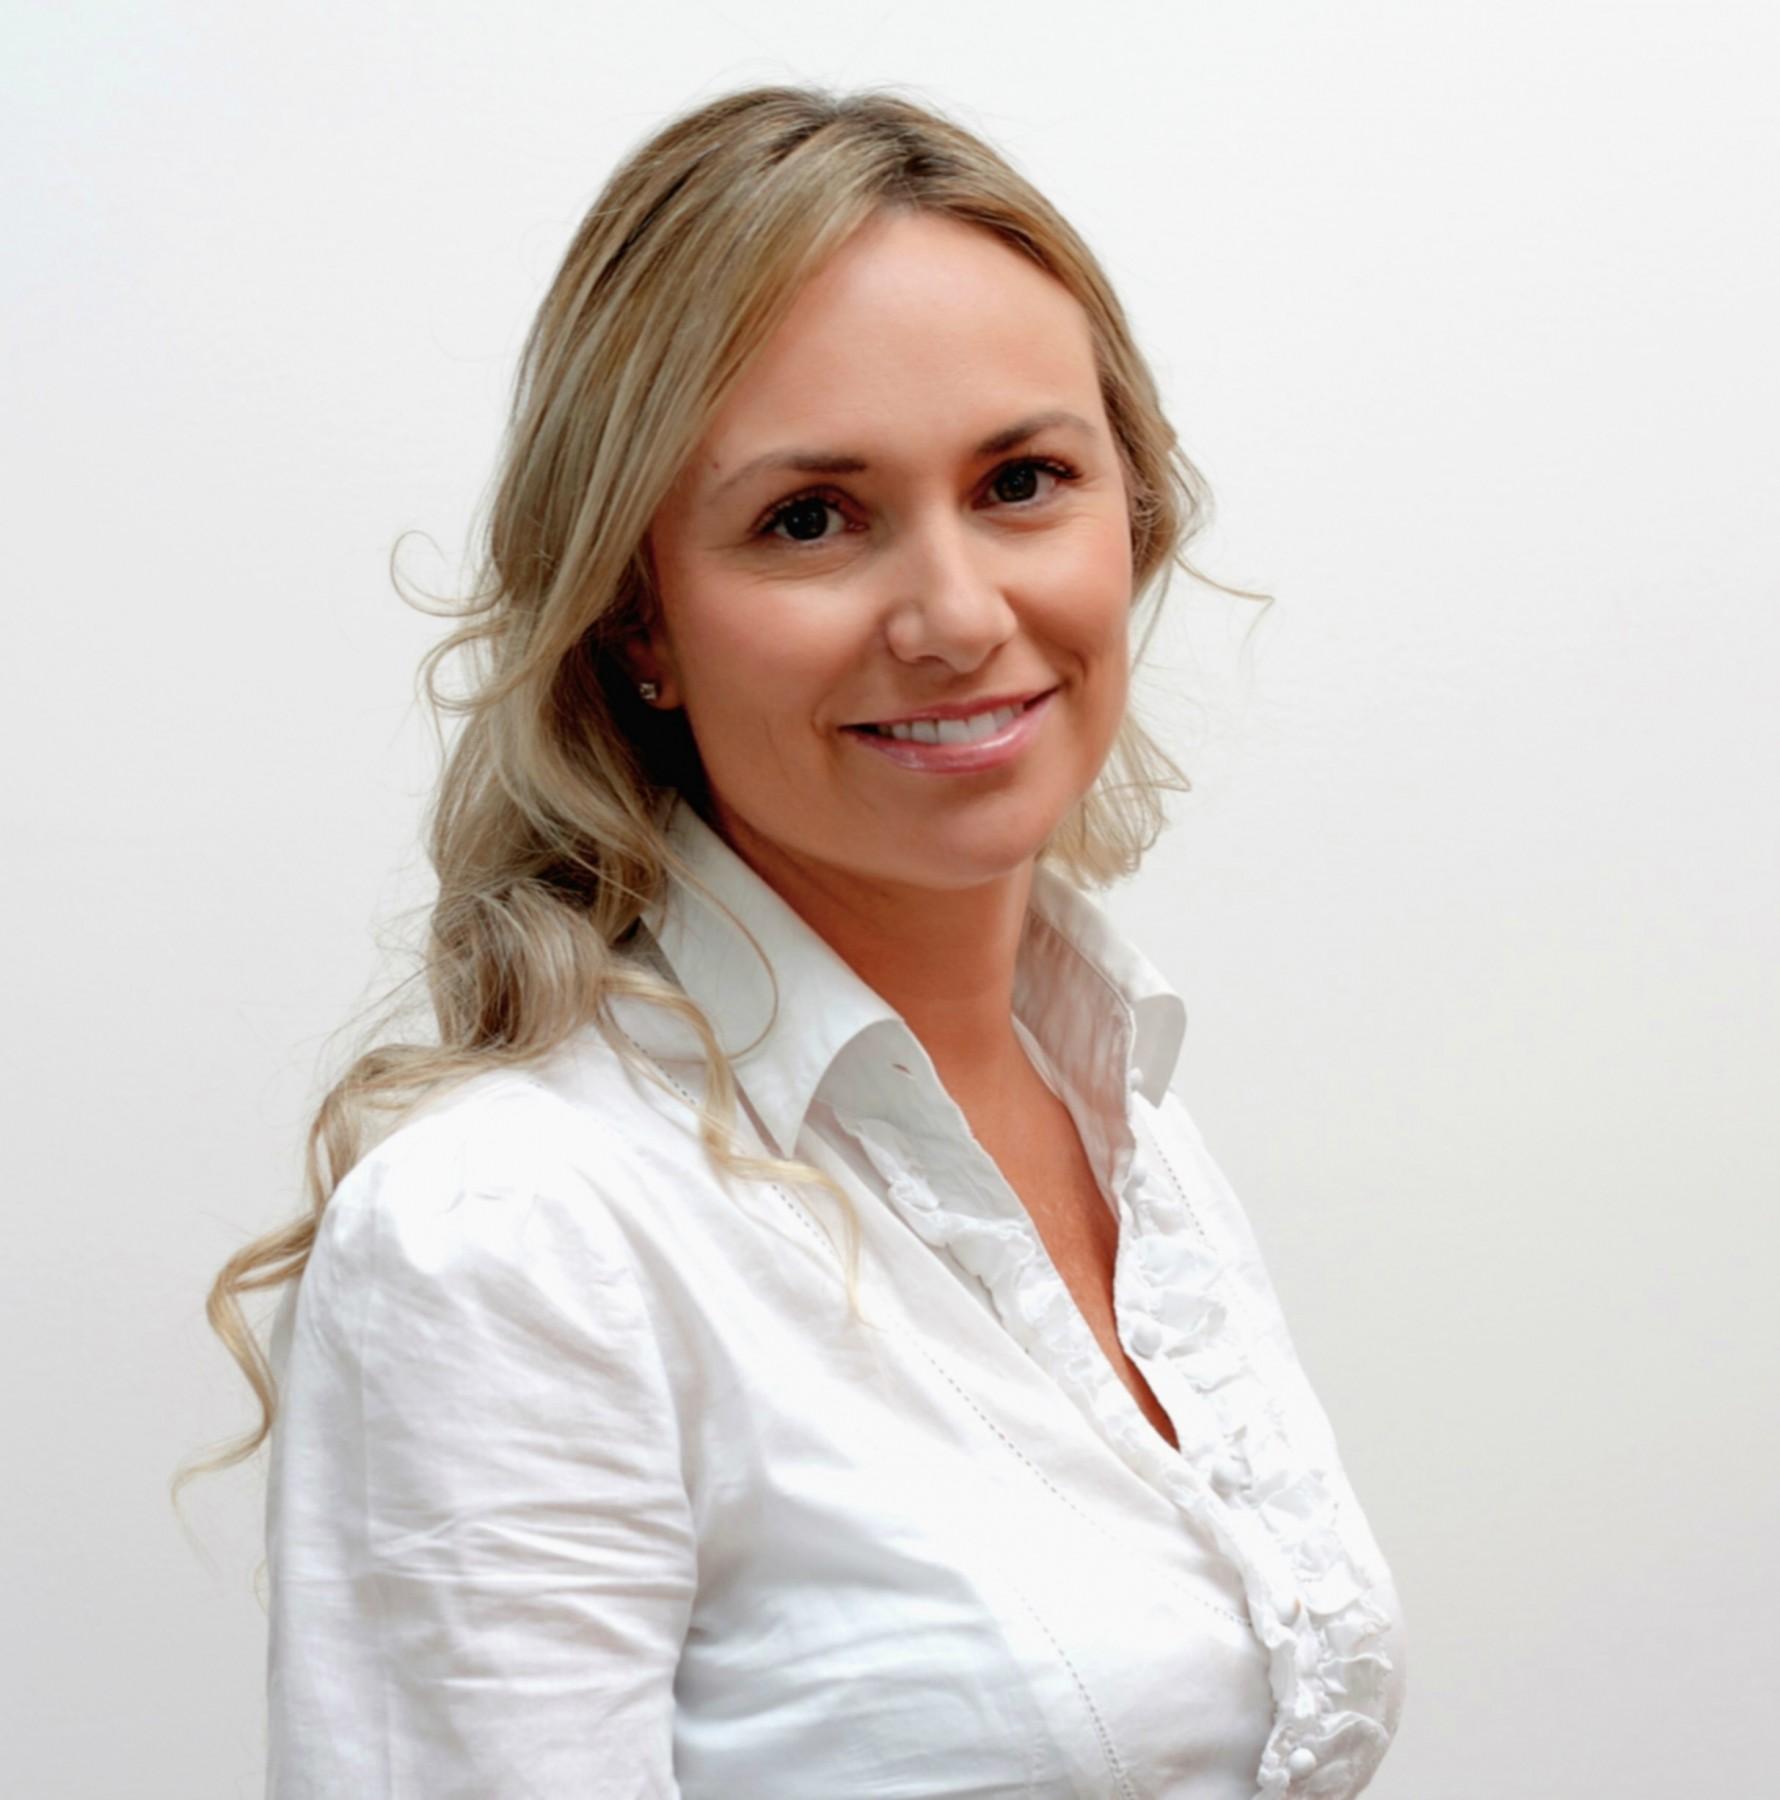 Rachel Garel - Dental Brokers Australia